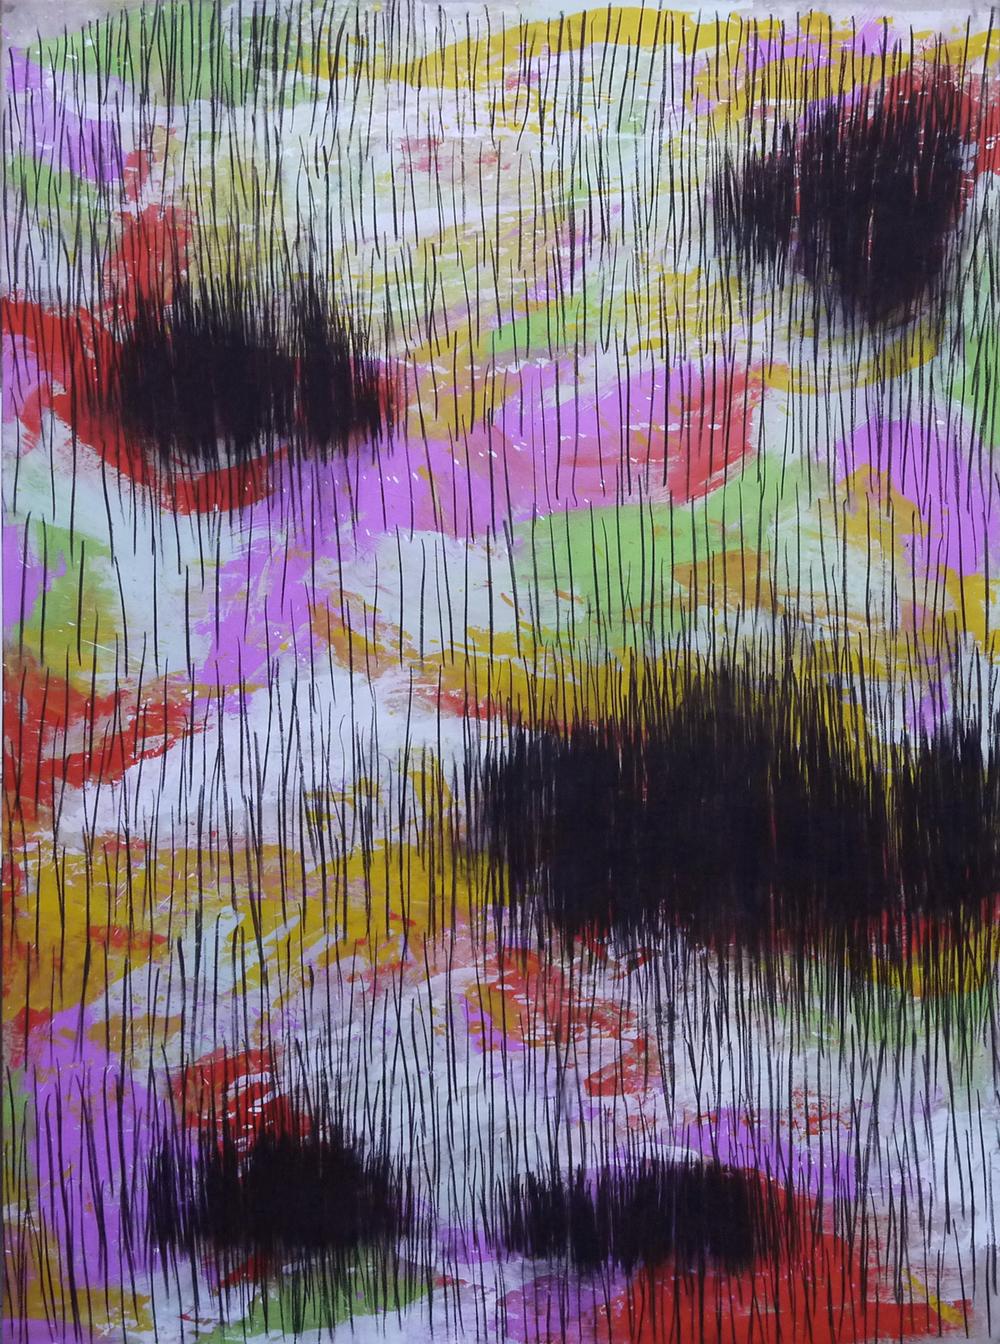 2011 - Paysages, noir brûlé / Black burnt landscape n°4